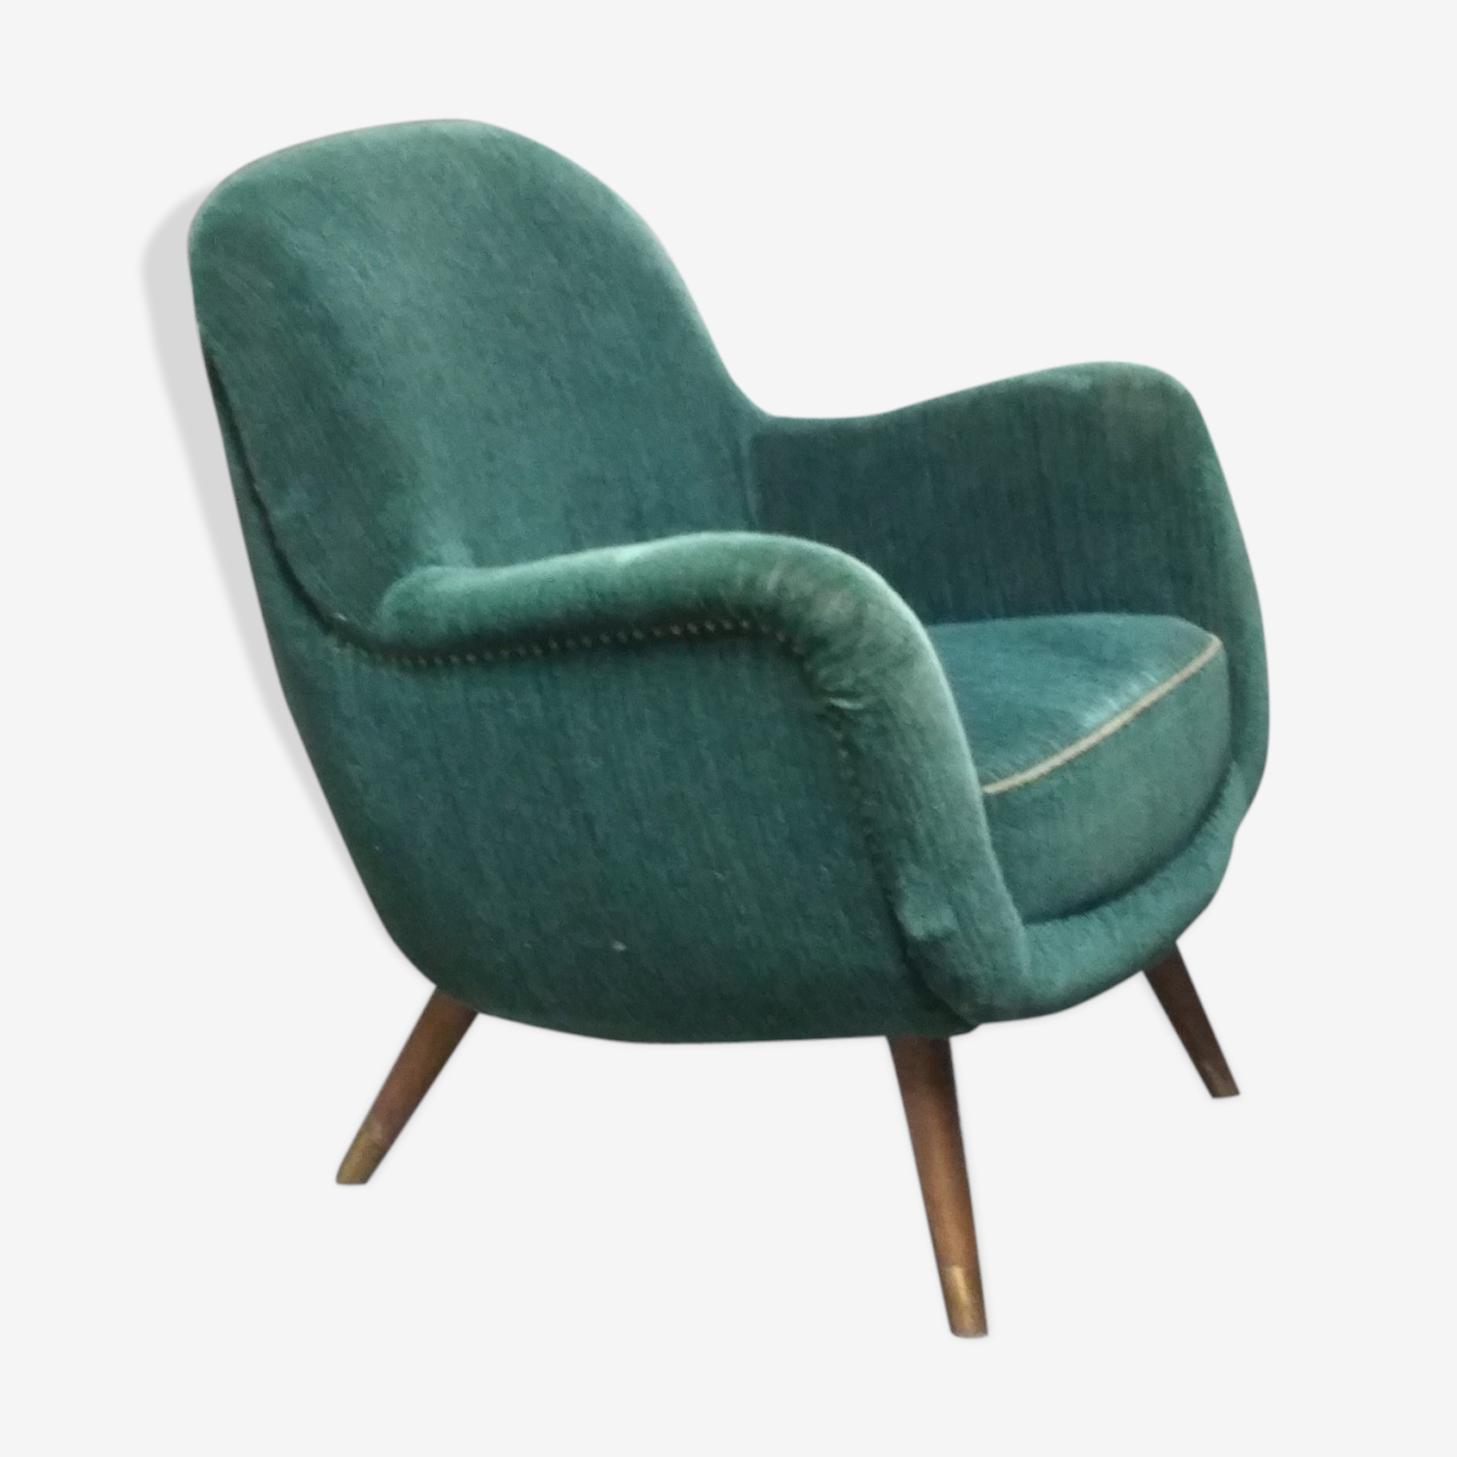 Egg armchair years 50/60